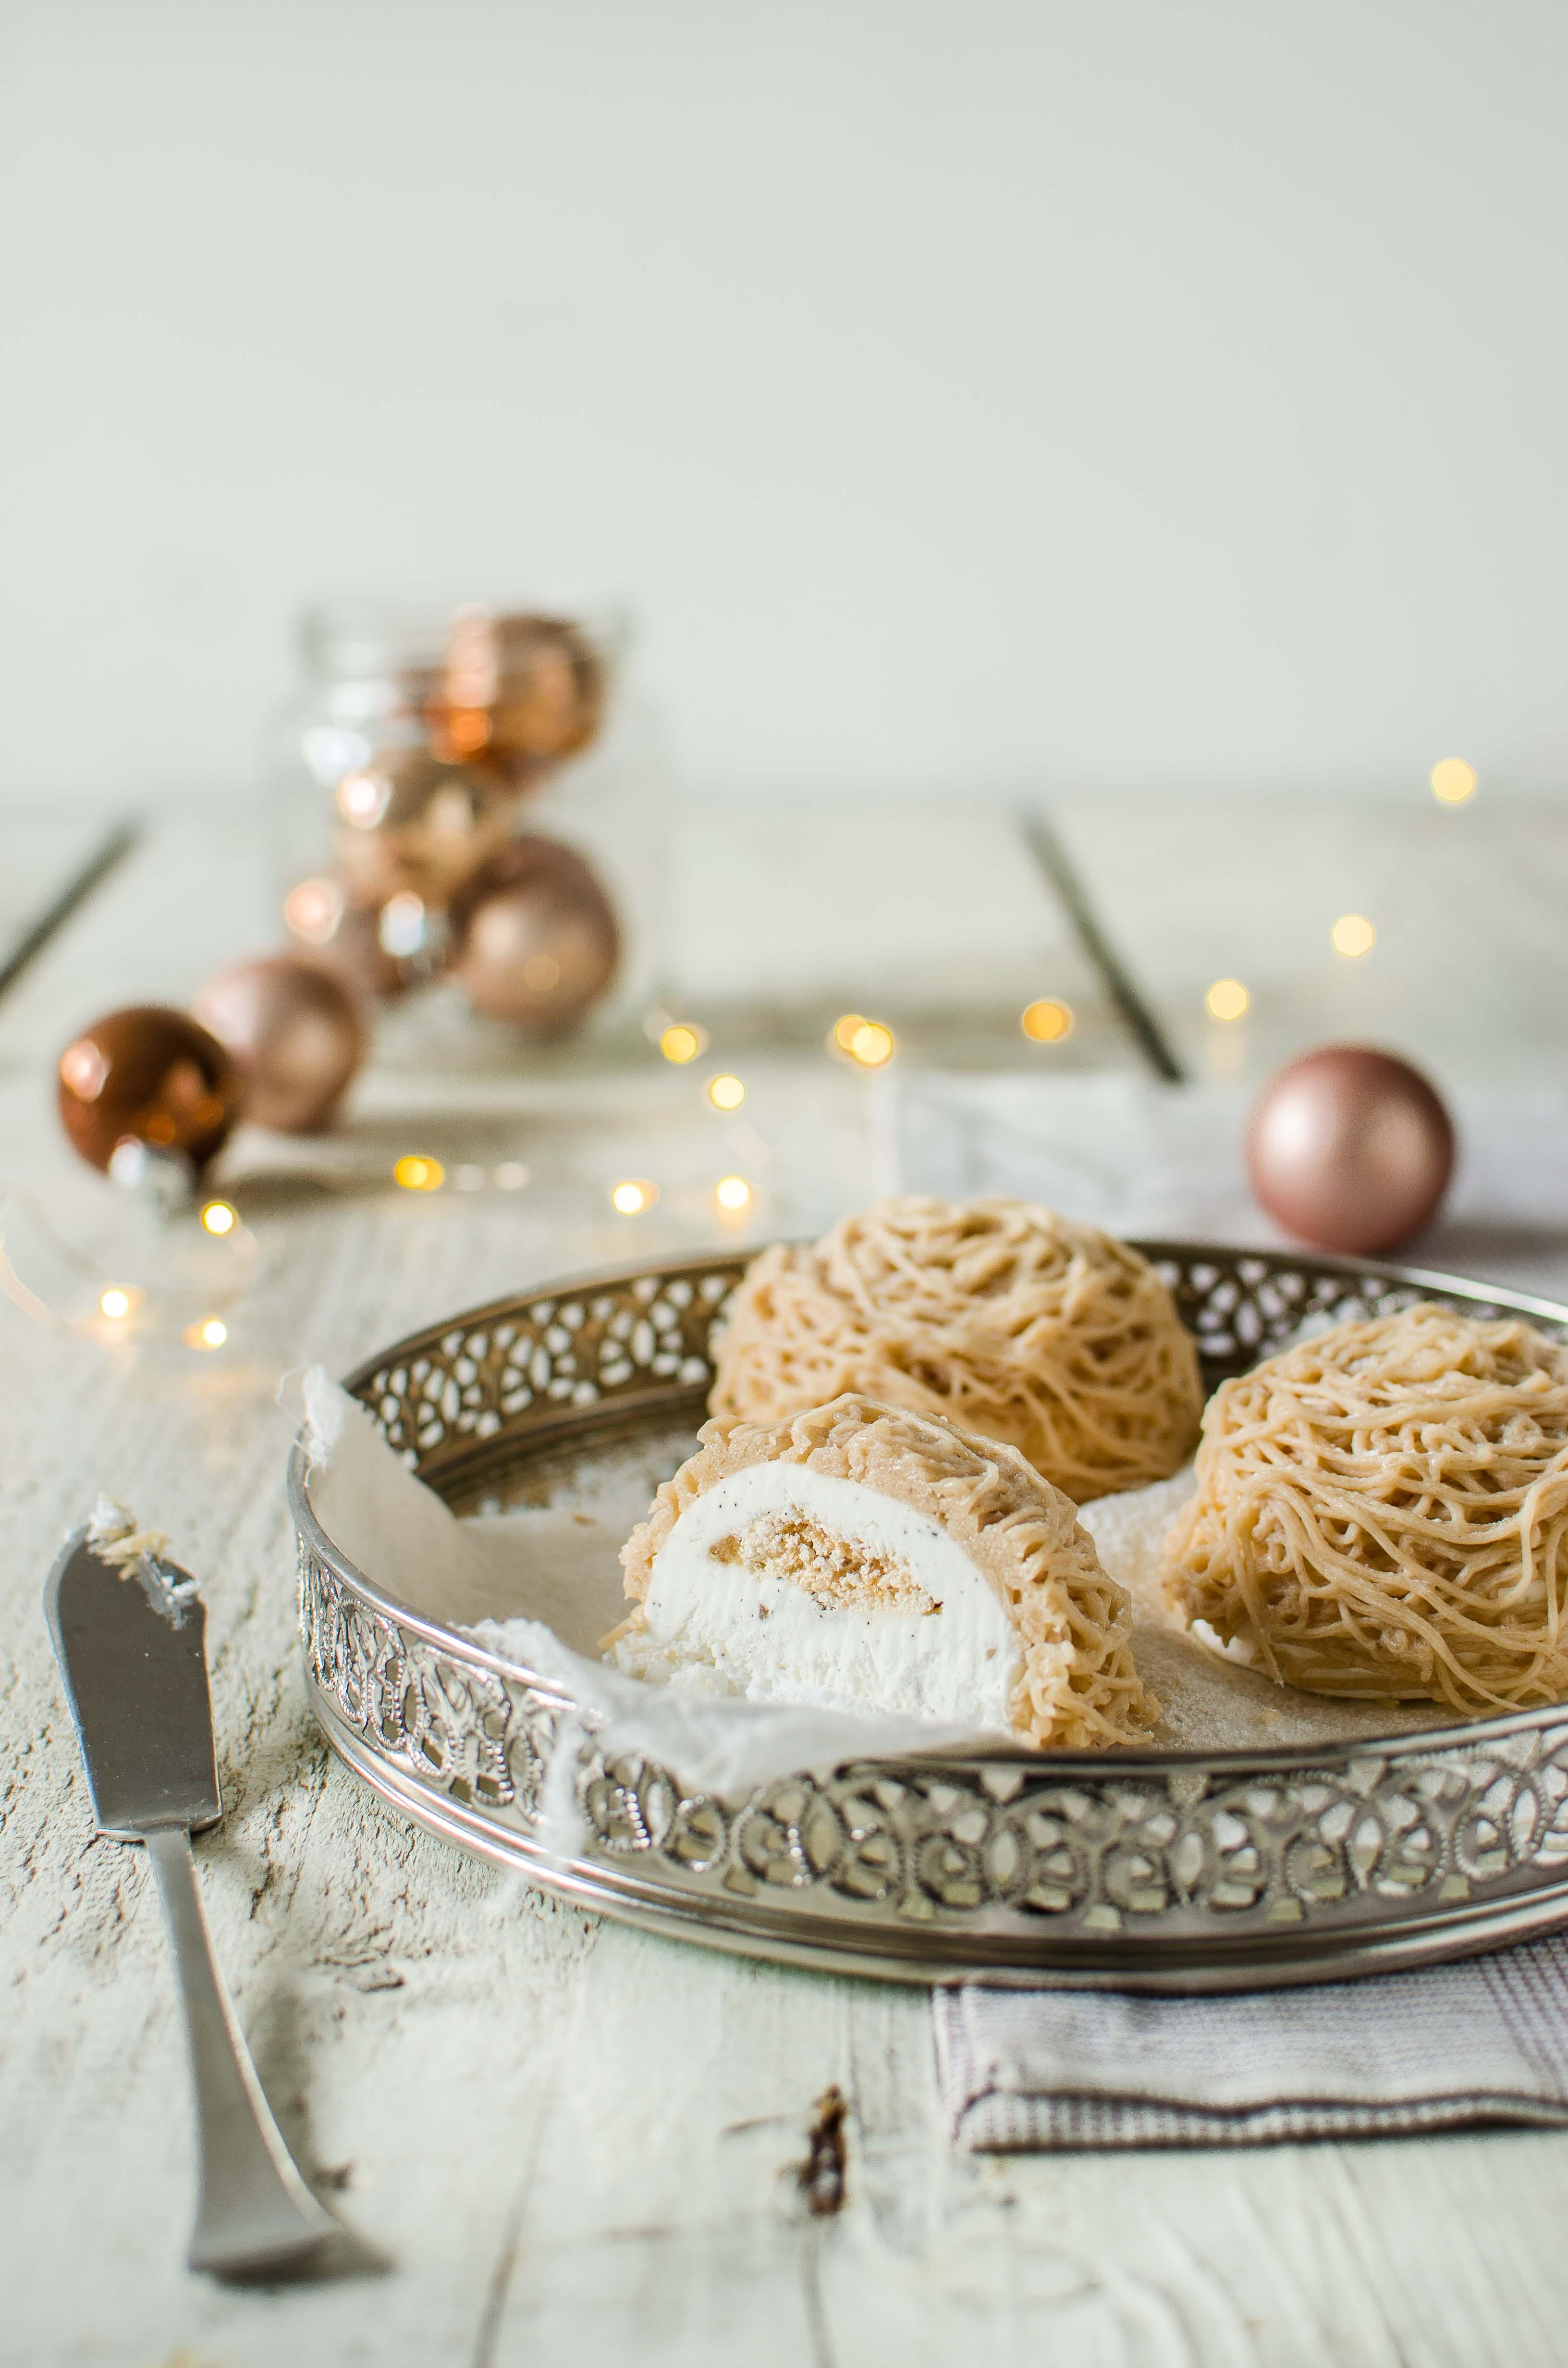 mont-blanc-dessert Mont blanc merveilleux